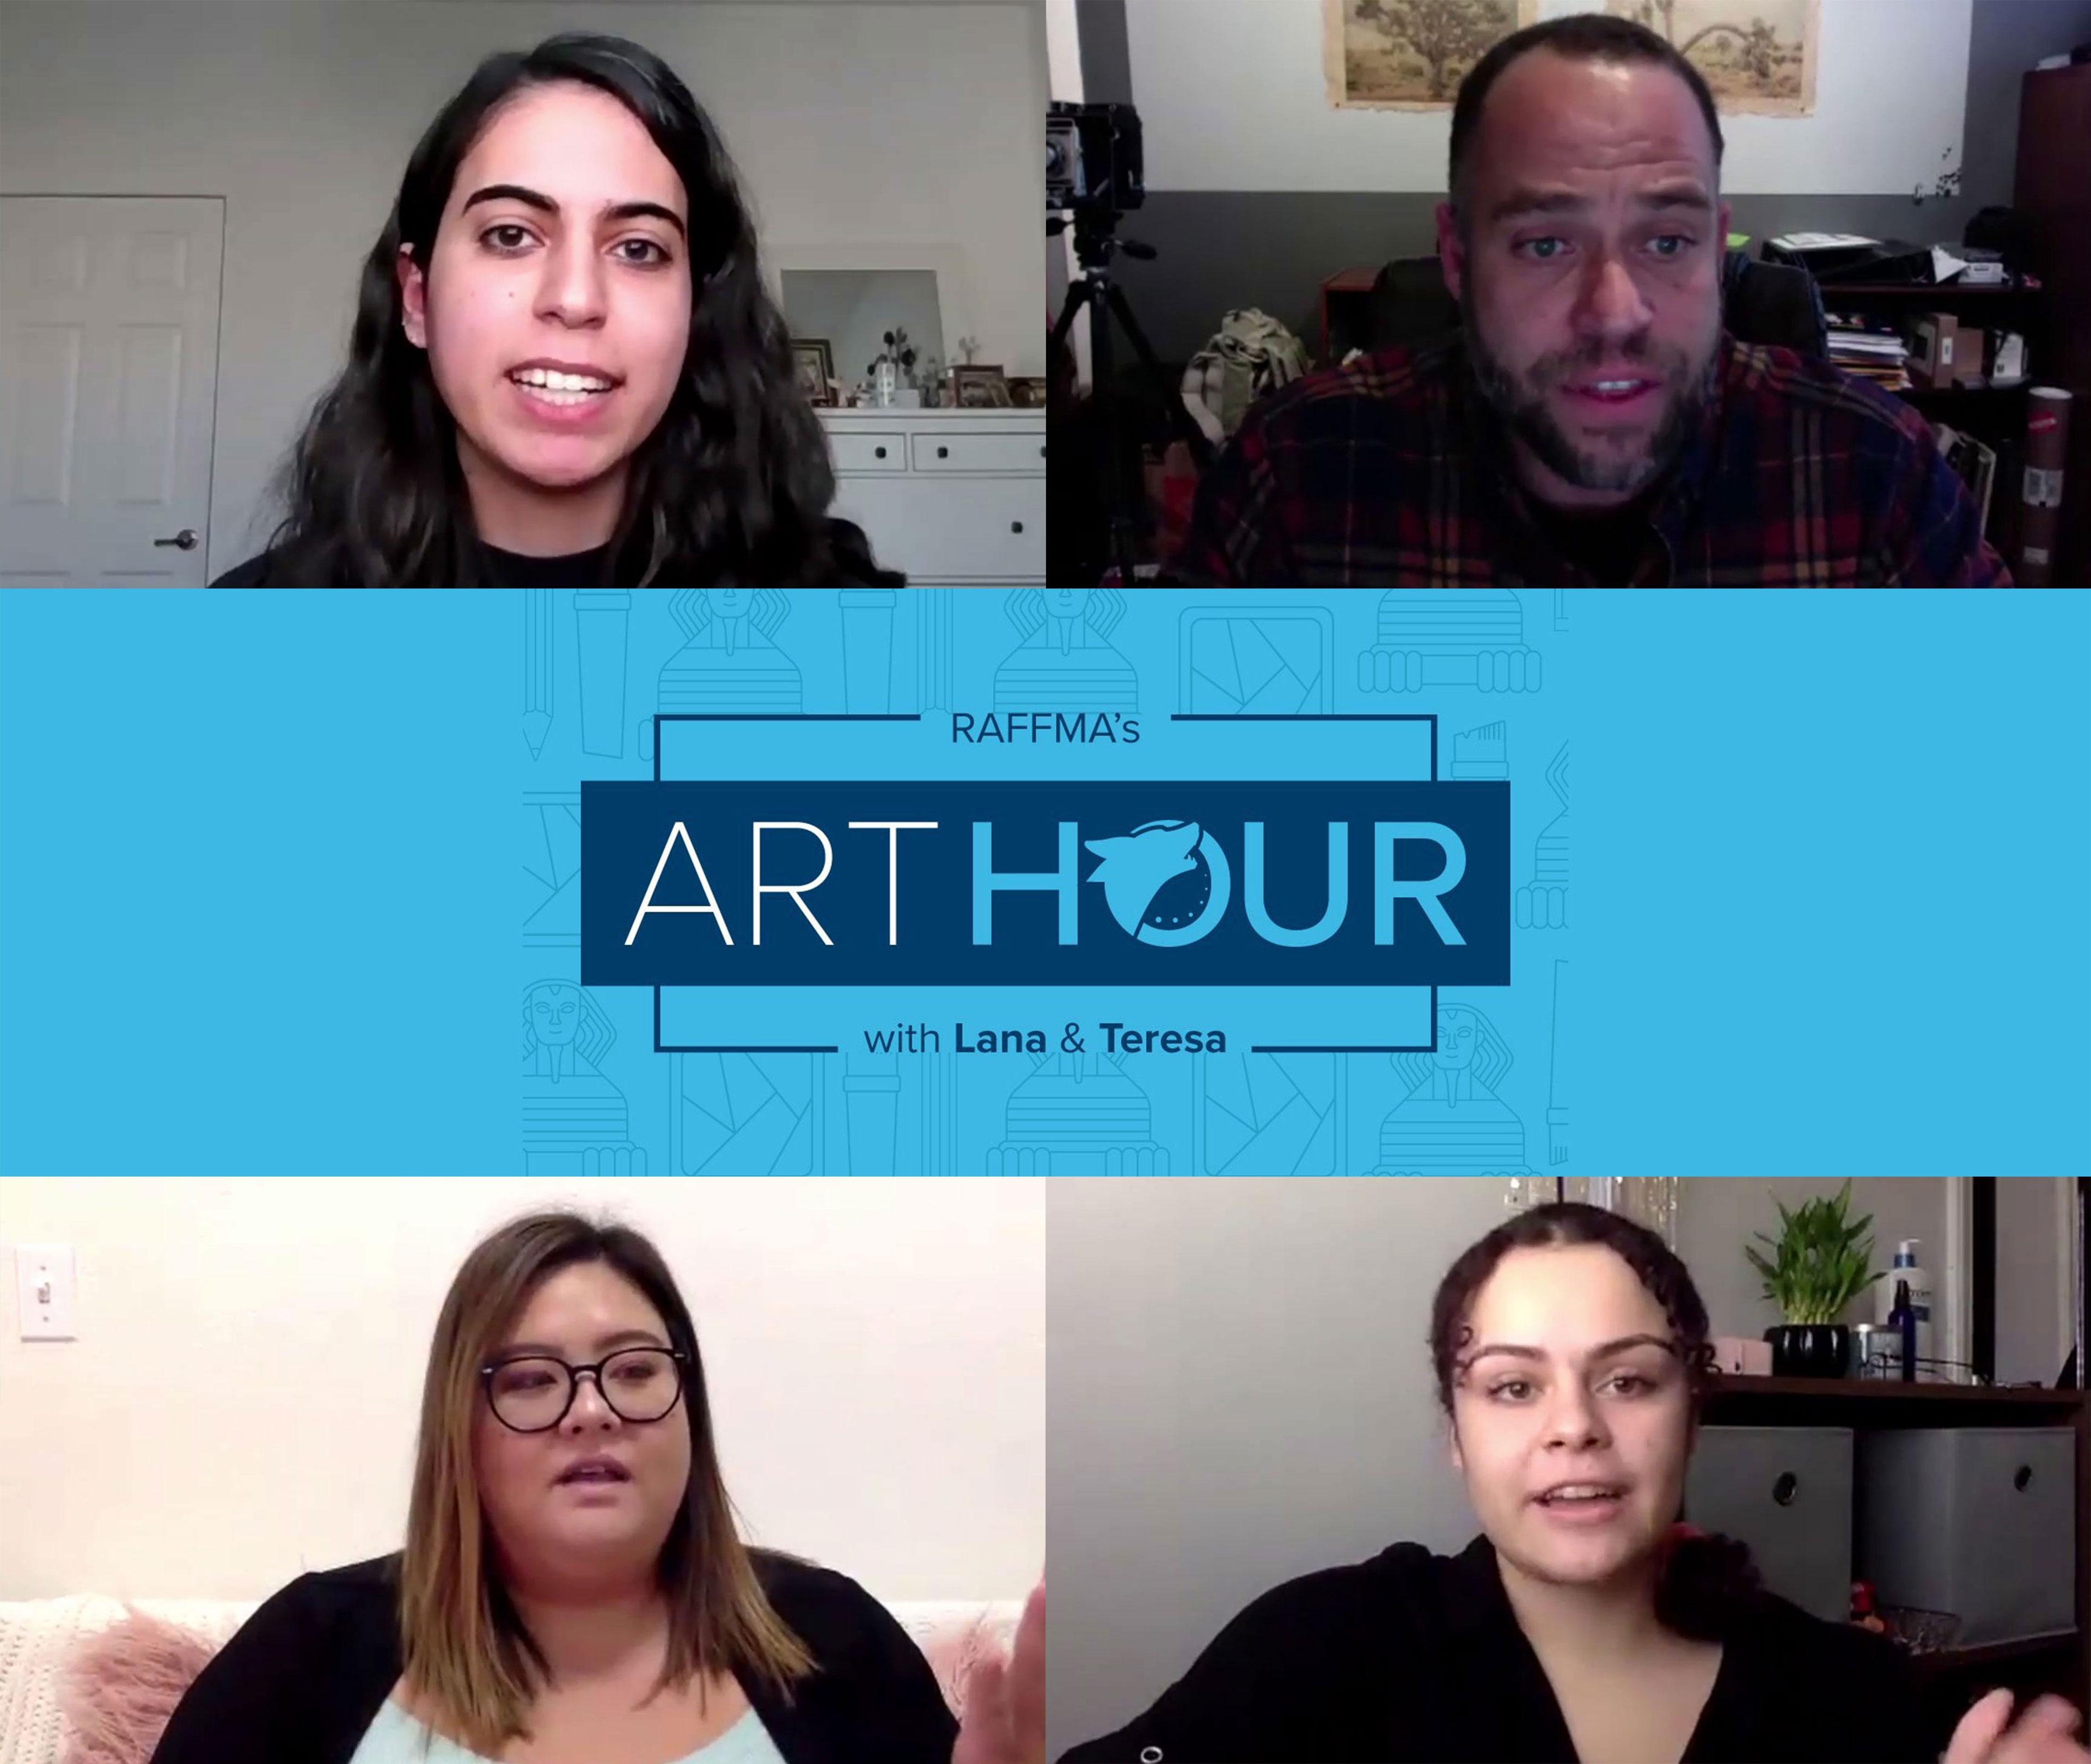 RAFFMA's Art Hour with Lana & Teresa